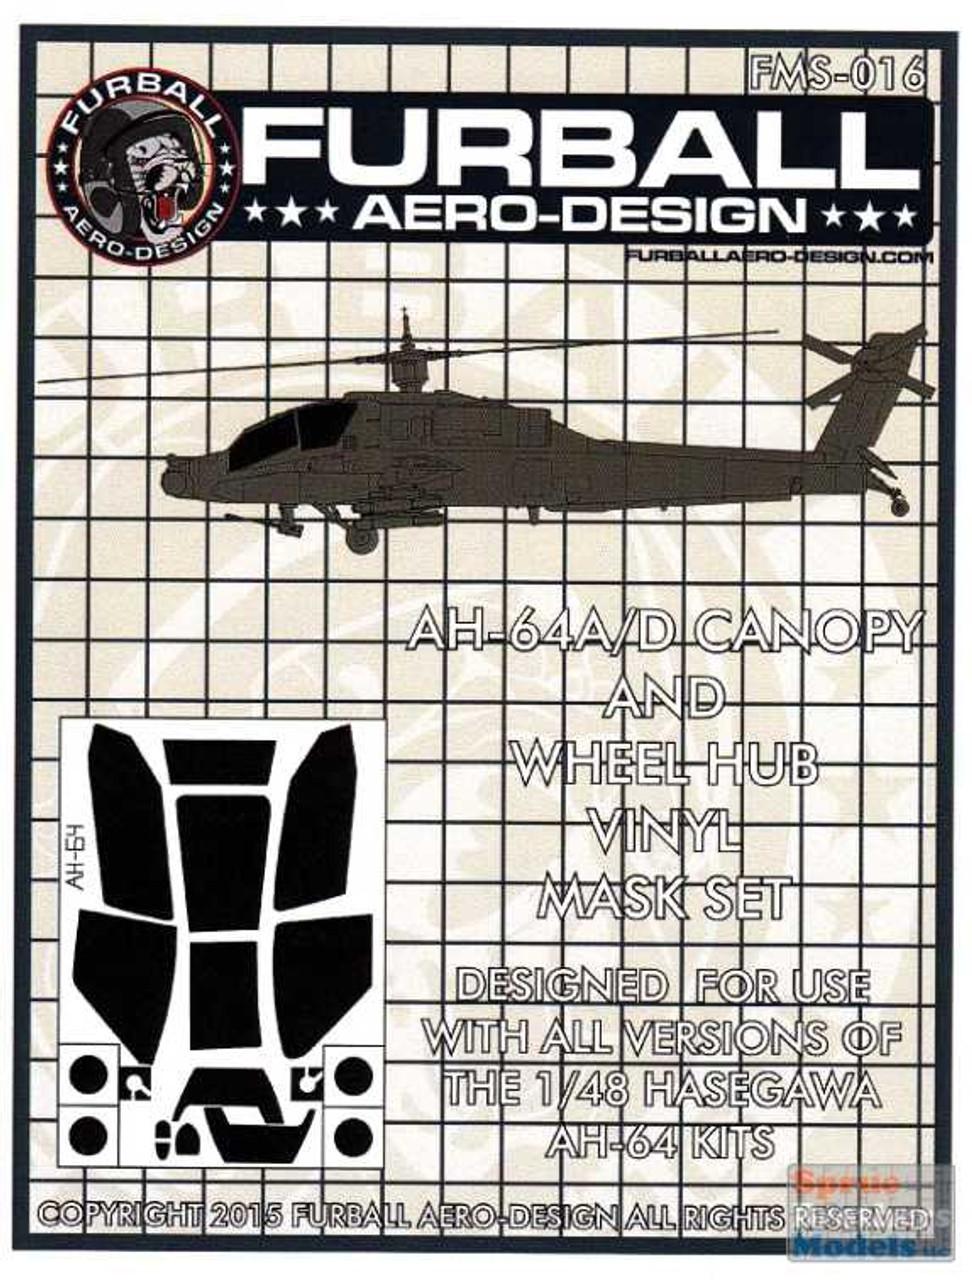 FURFMS016 1:48 Furball Aero Design Canopy & Wheel Hub Vinyl Mask Set for AH-64A AH-64D Apache (HAS kit)